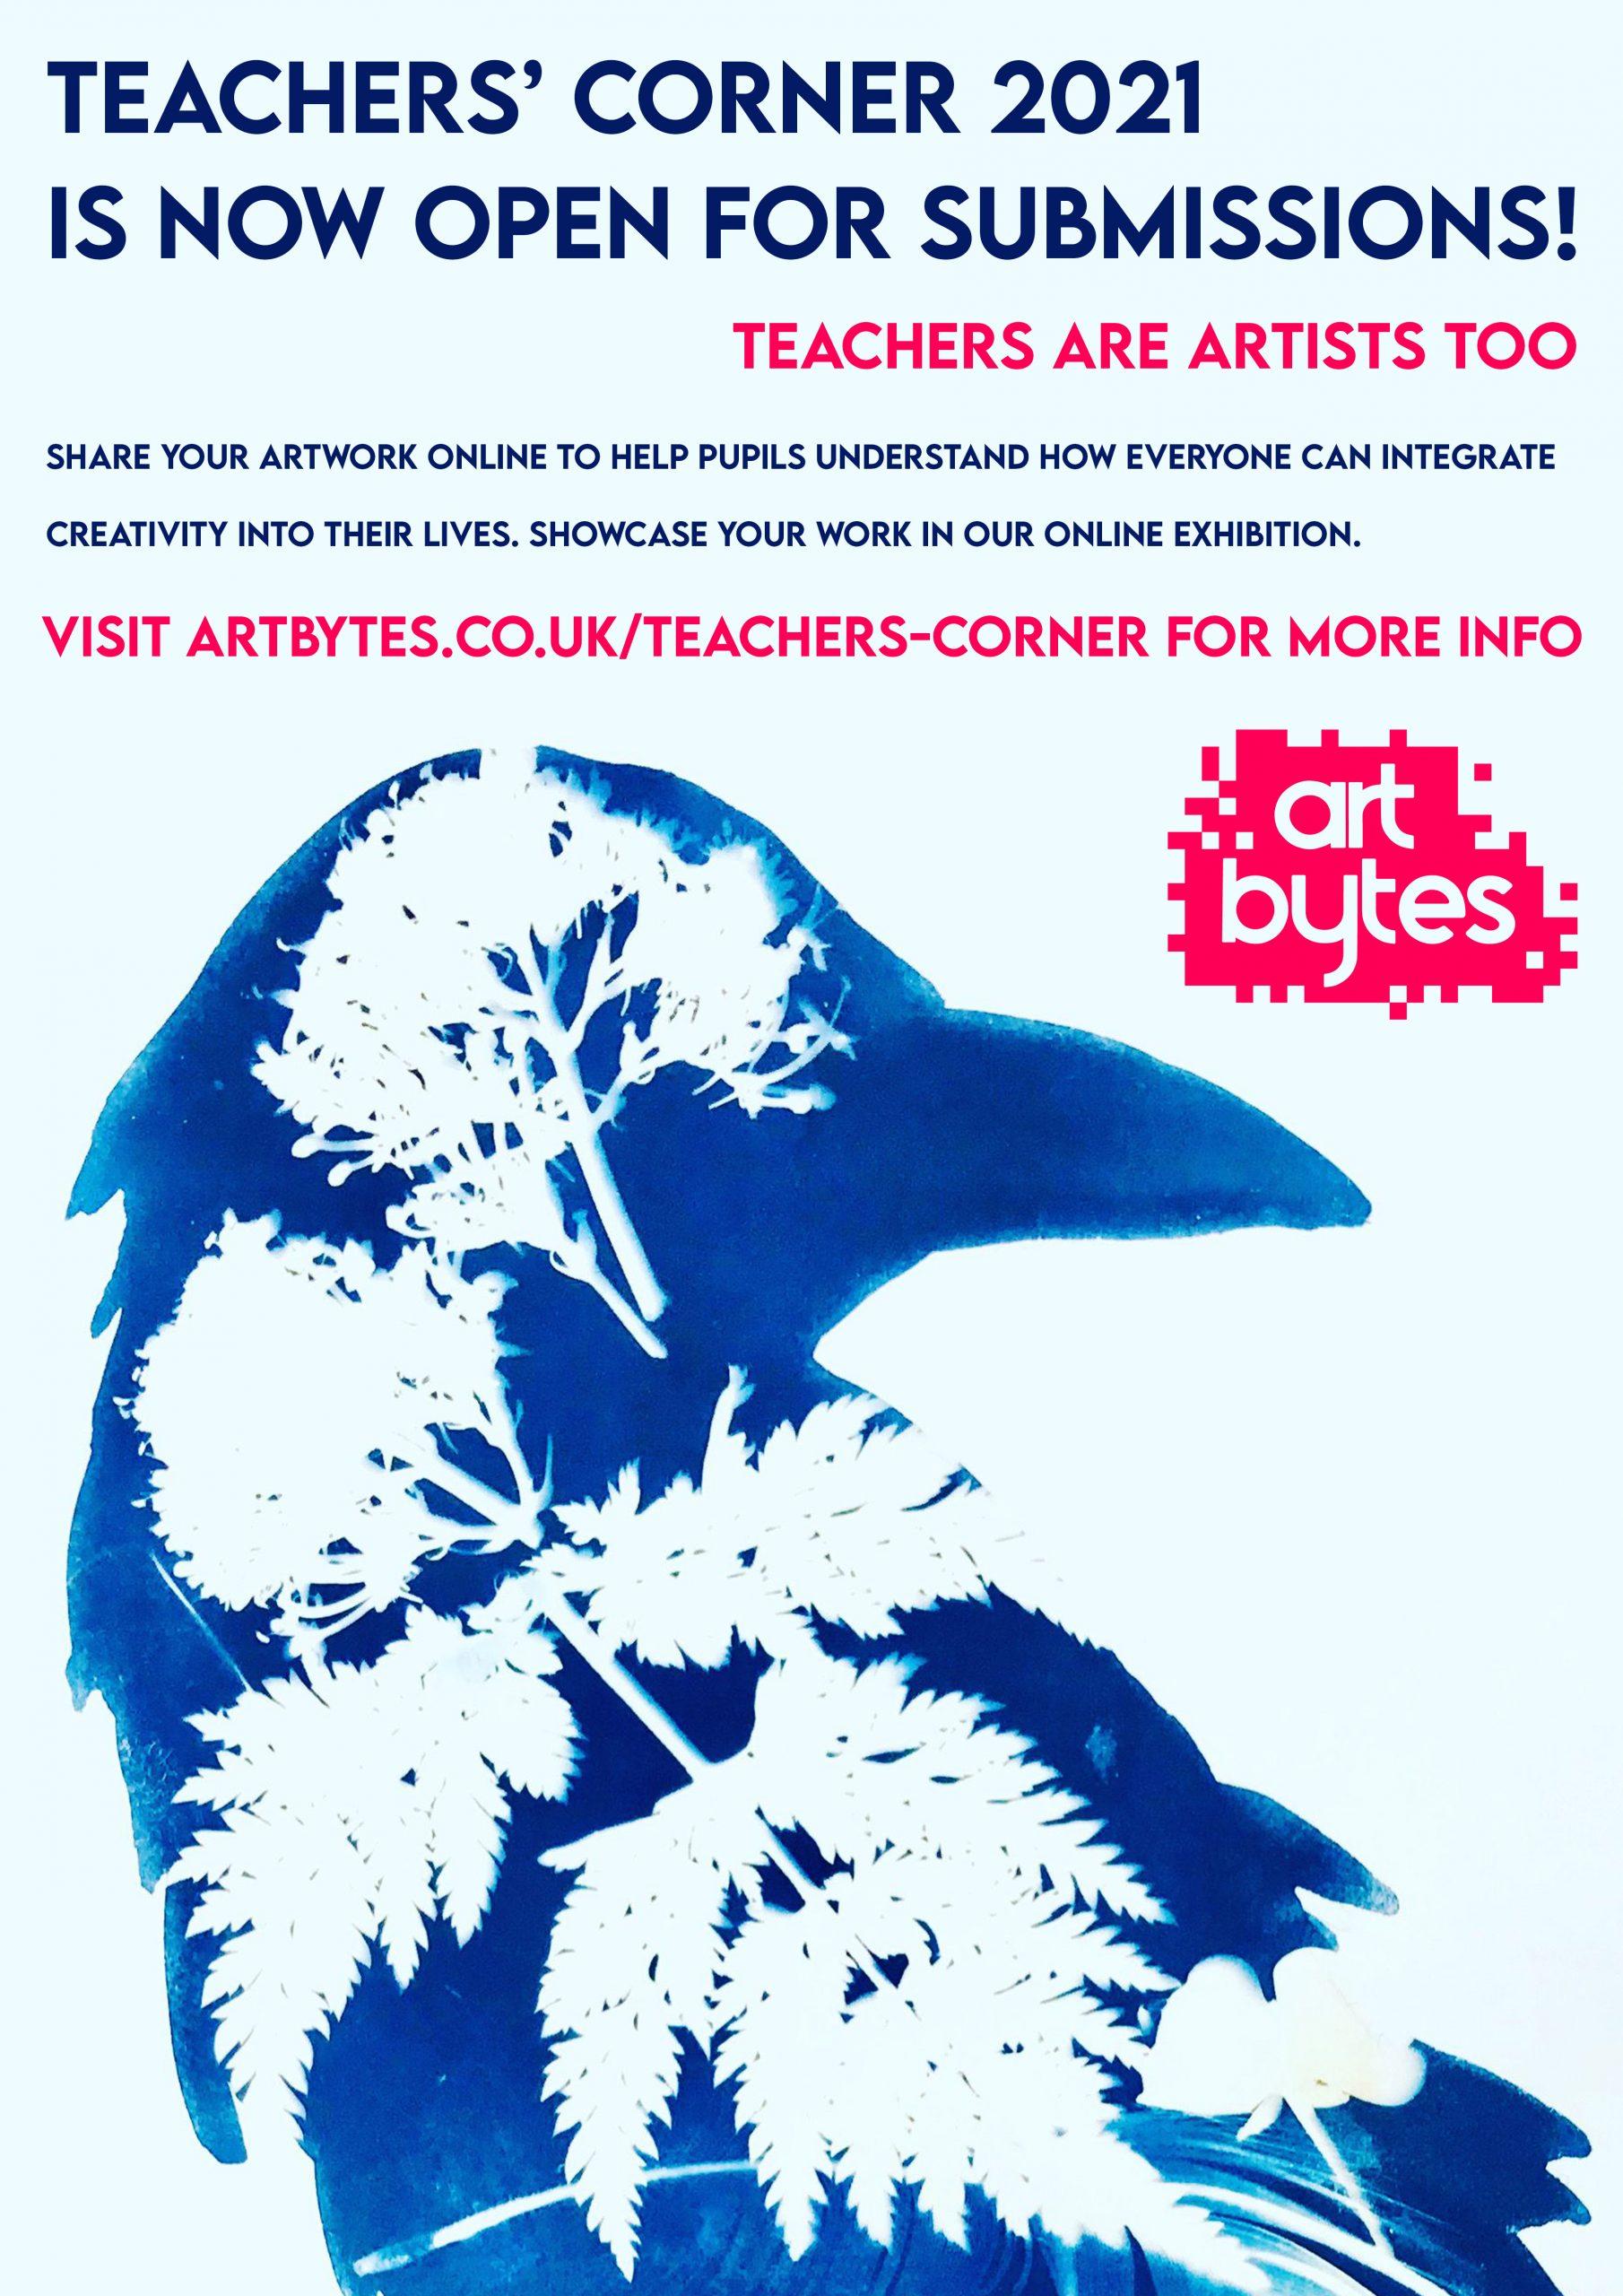 Teachers' Corner Call 2021